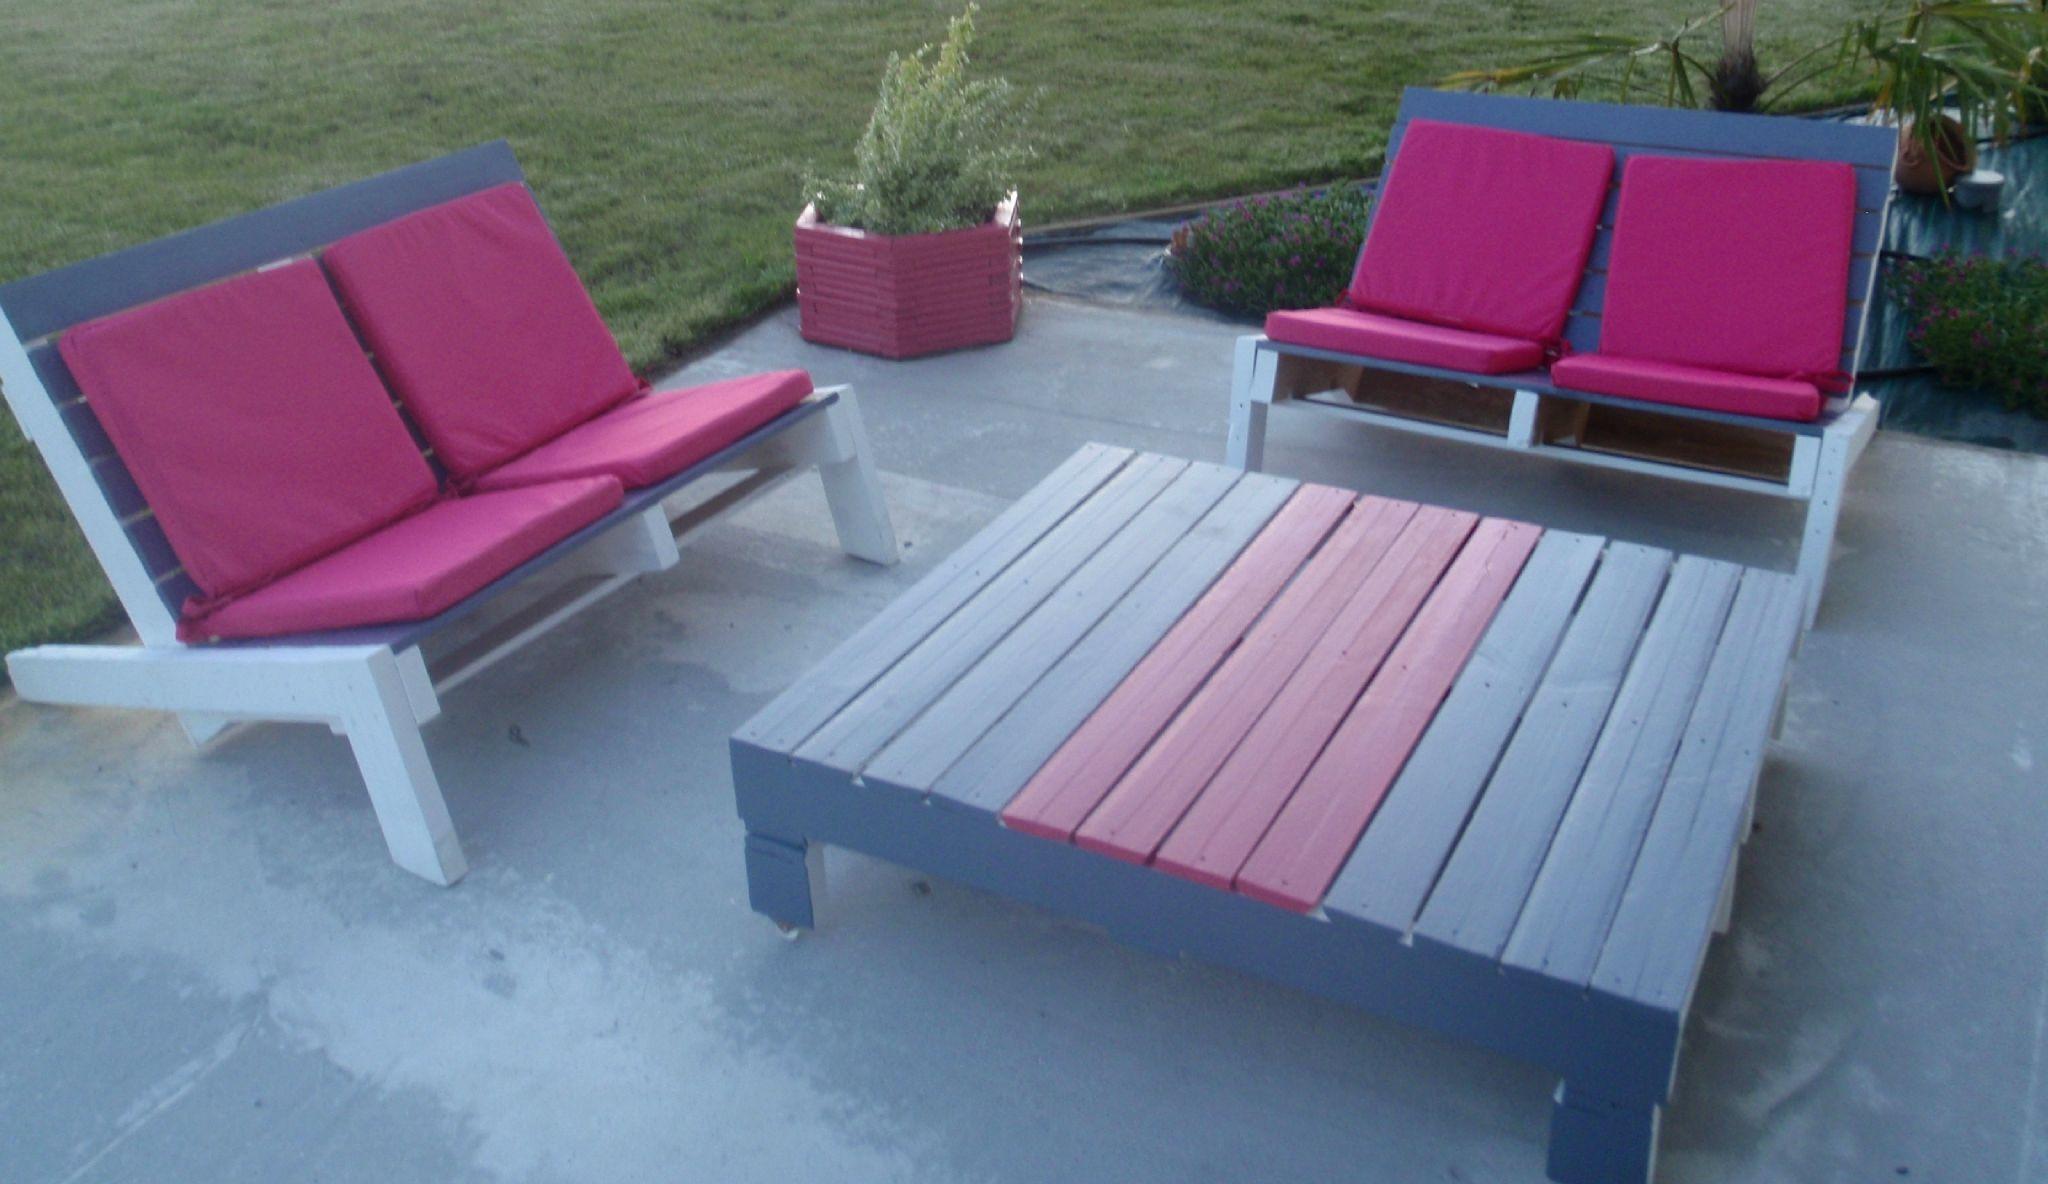 Salon jardin avec palette bois : Realiser un salon de jardin en ...